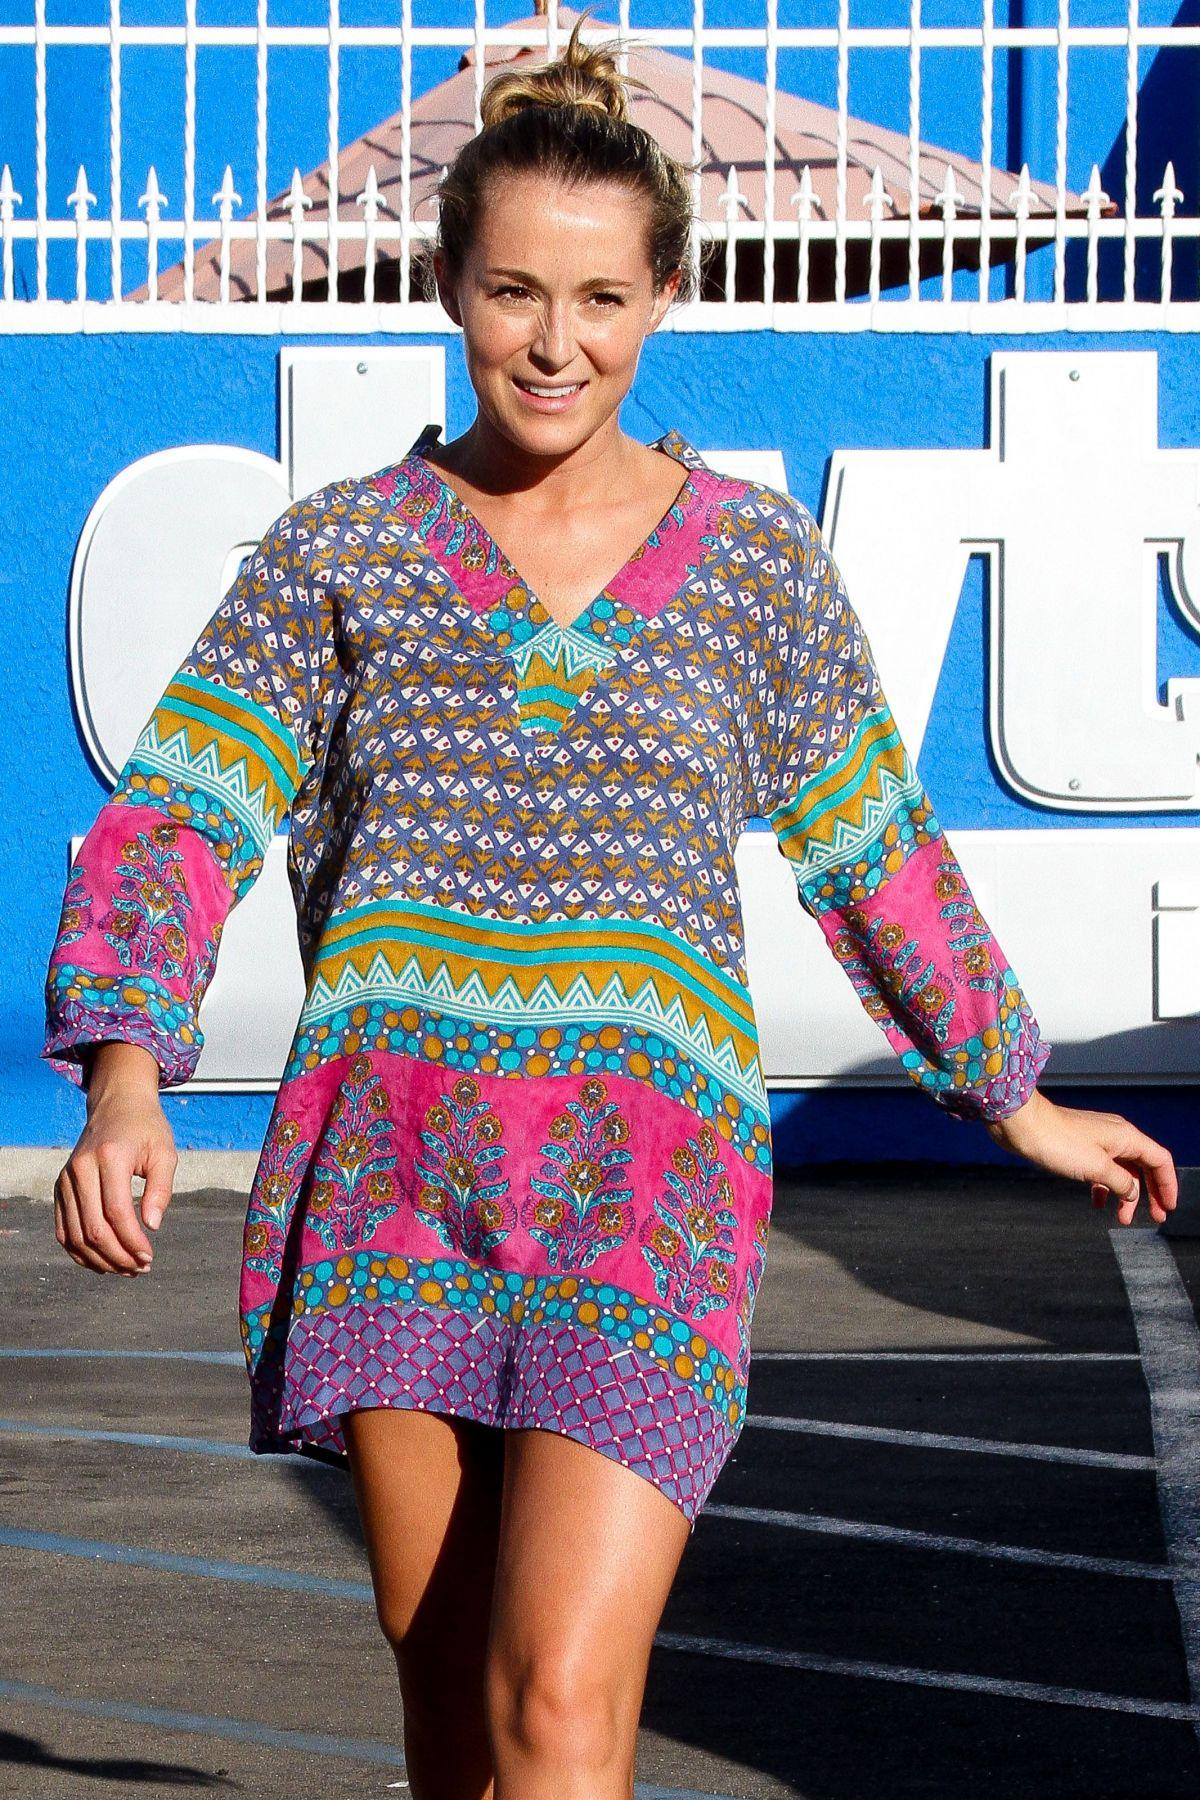 ALEXA VEGA at Dancing with the Stars Studio in Los Angeles 10/11/2015